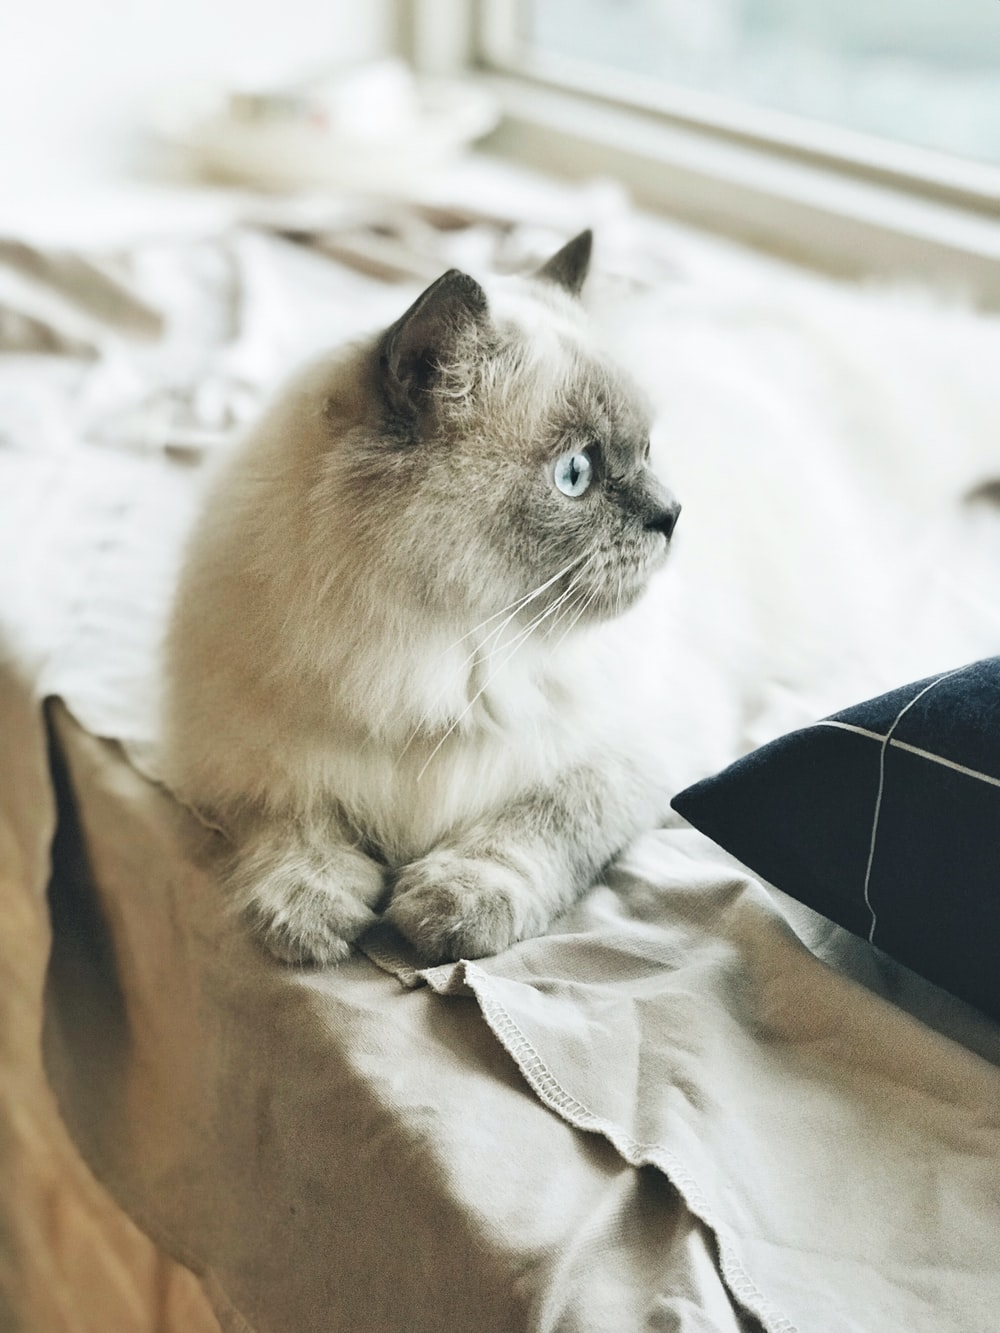 tilt-shift photography of kitten near window